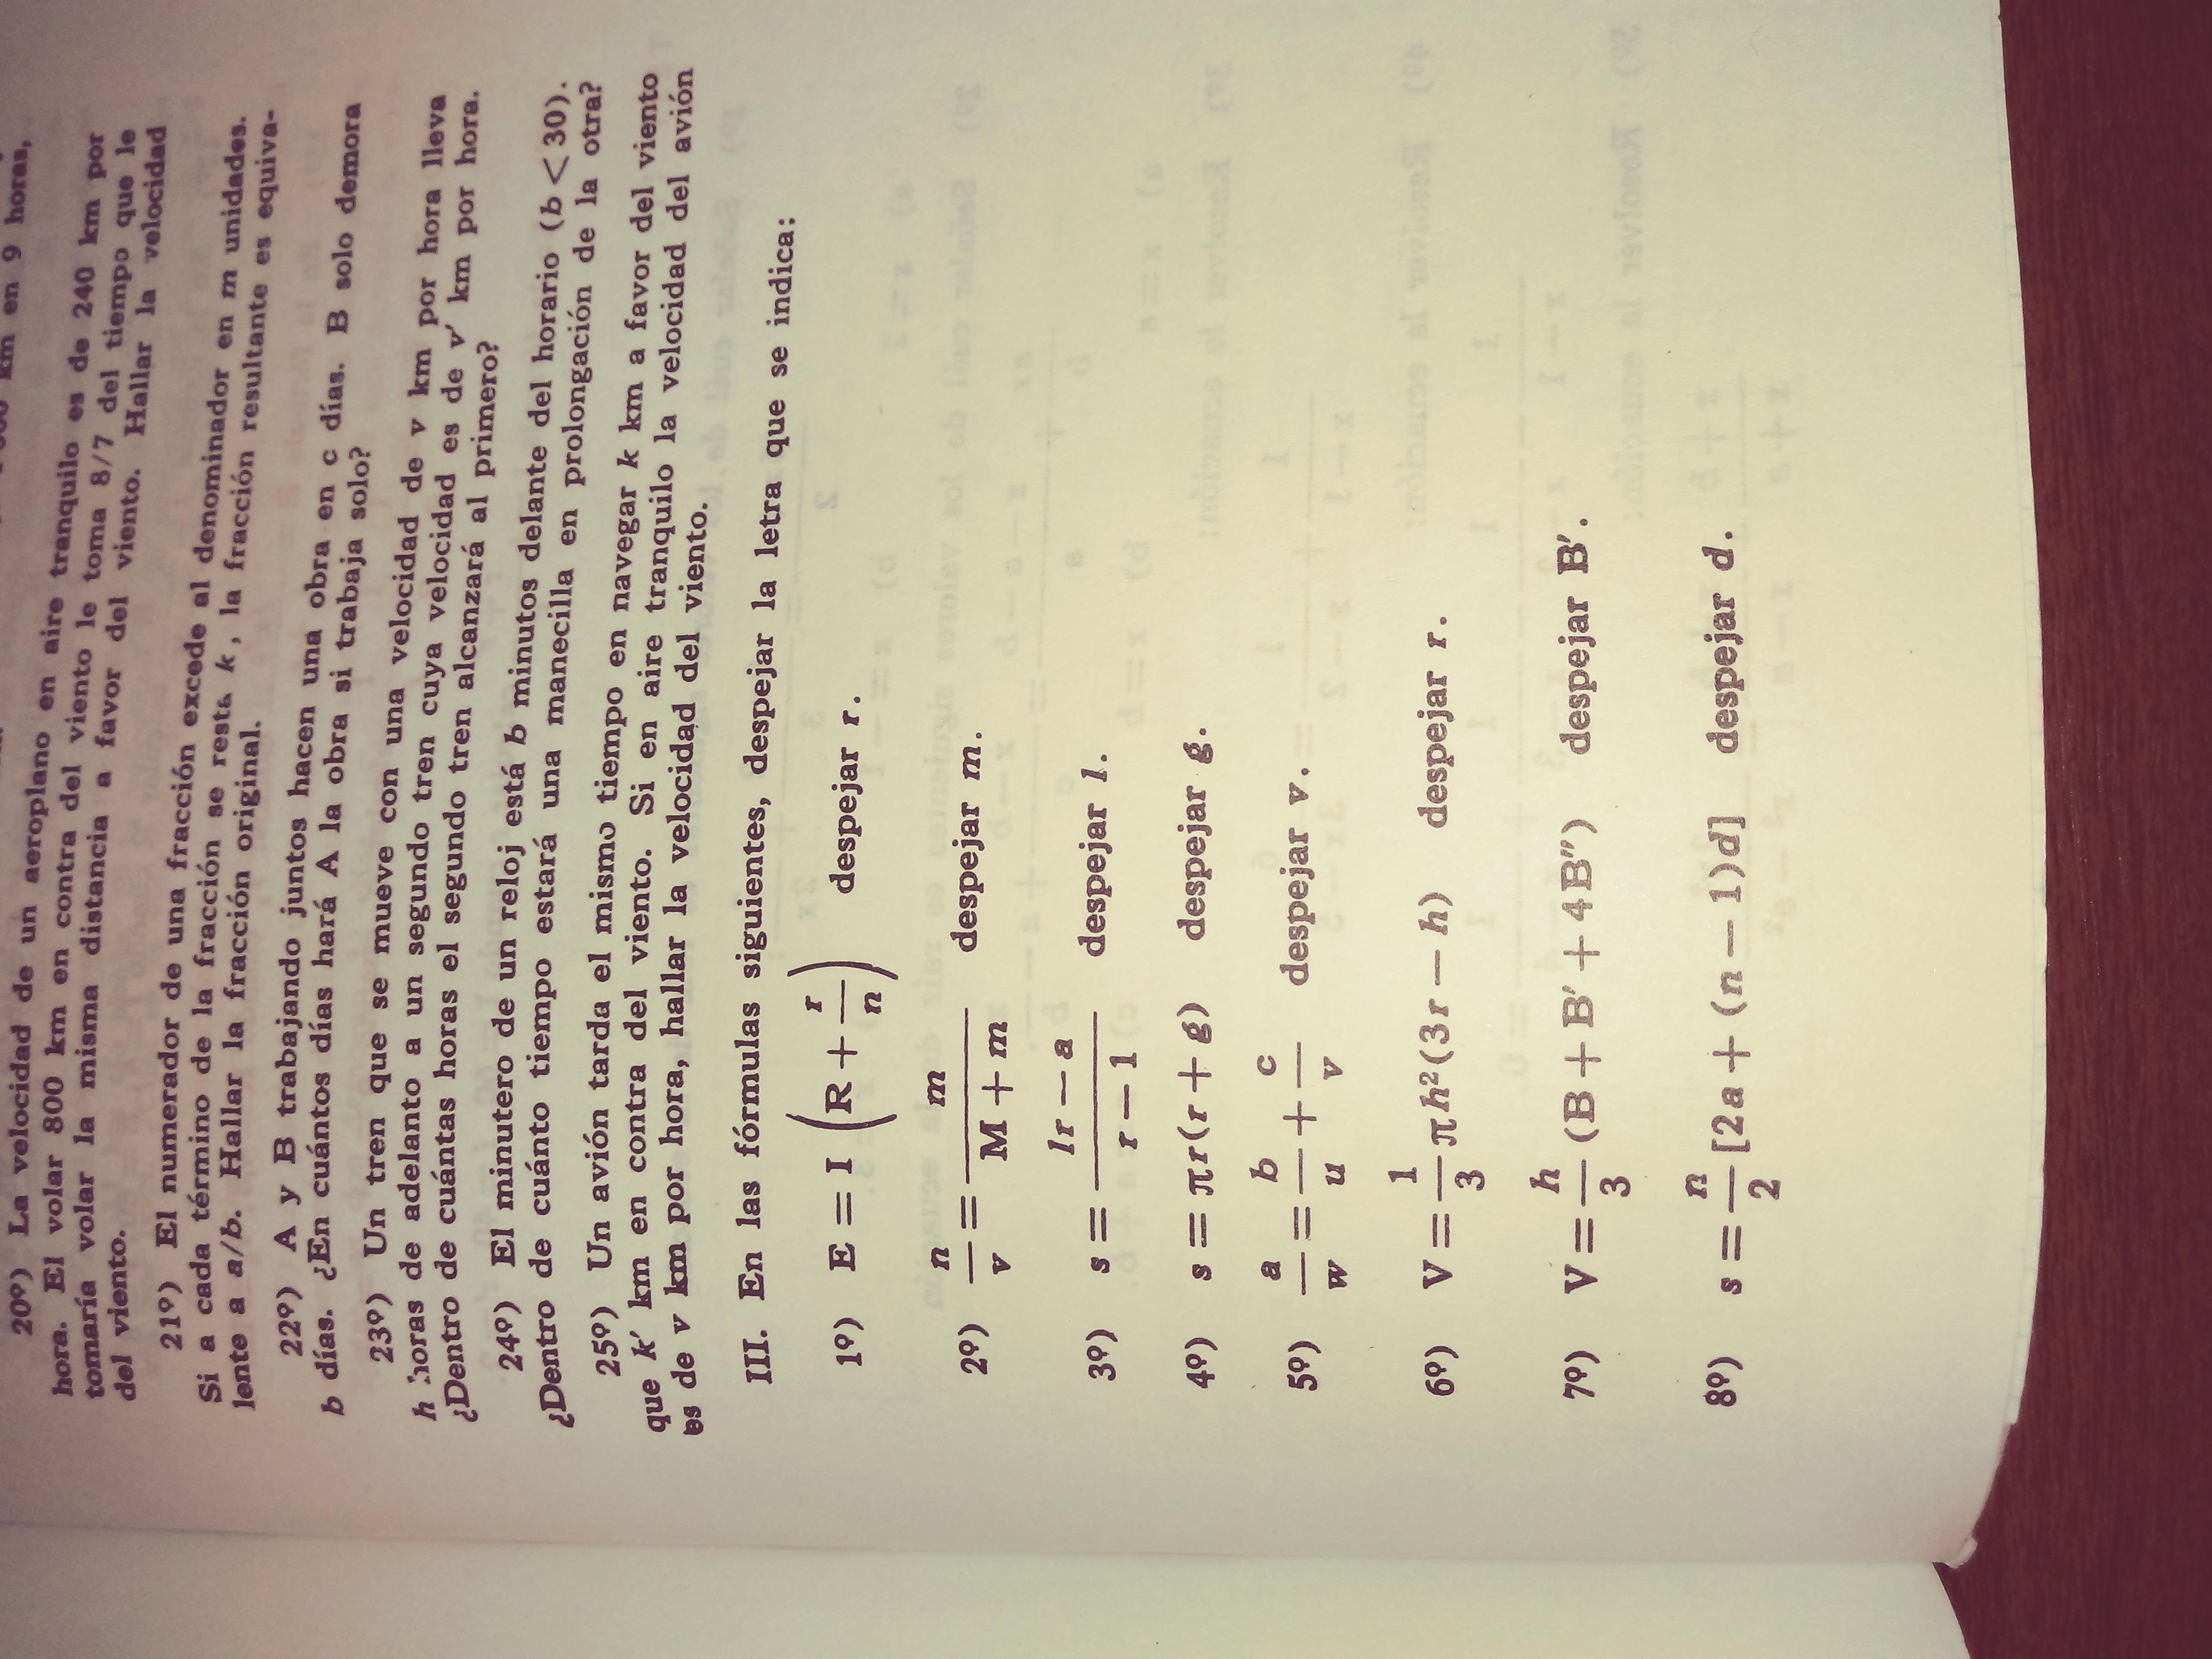 Calendario Civico Escolar 2019 Para Imprimir Más Recientes Index Of Sscc Cuenca Documentos Of Calendario Civico Escolar 2019 Para Imprimir Recientes Fuvest Manual Do Candidato Manual Do Candidato Que